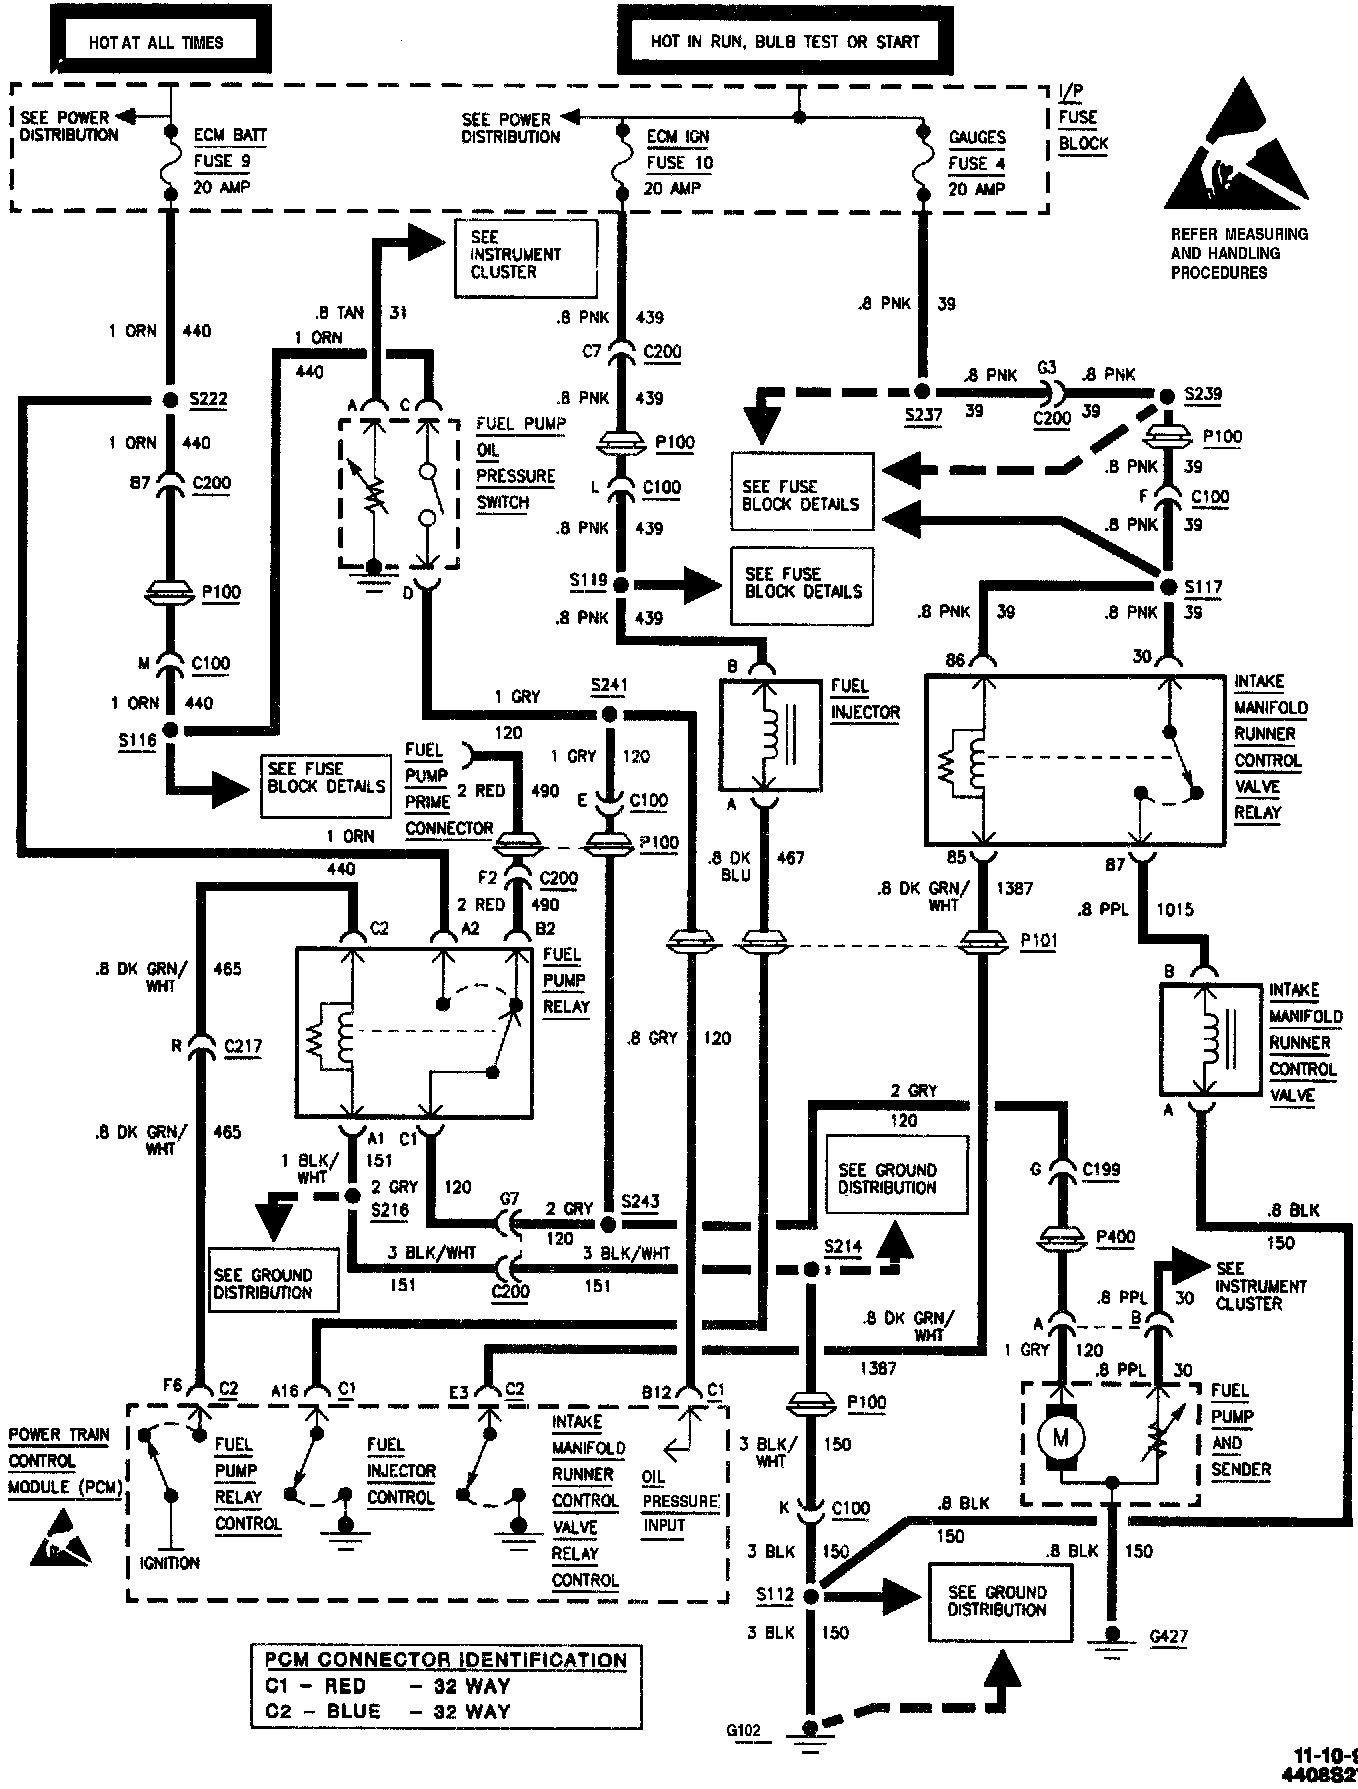 [DIAGRAM] Bmw E53 Wiring Diagram